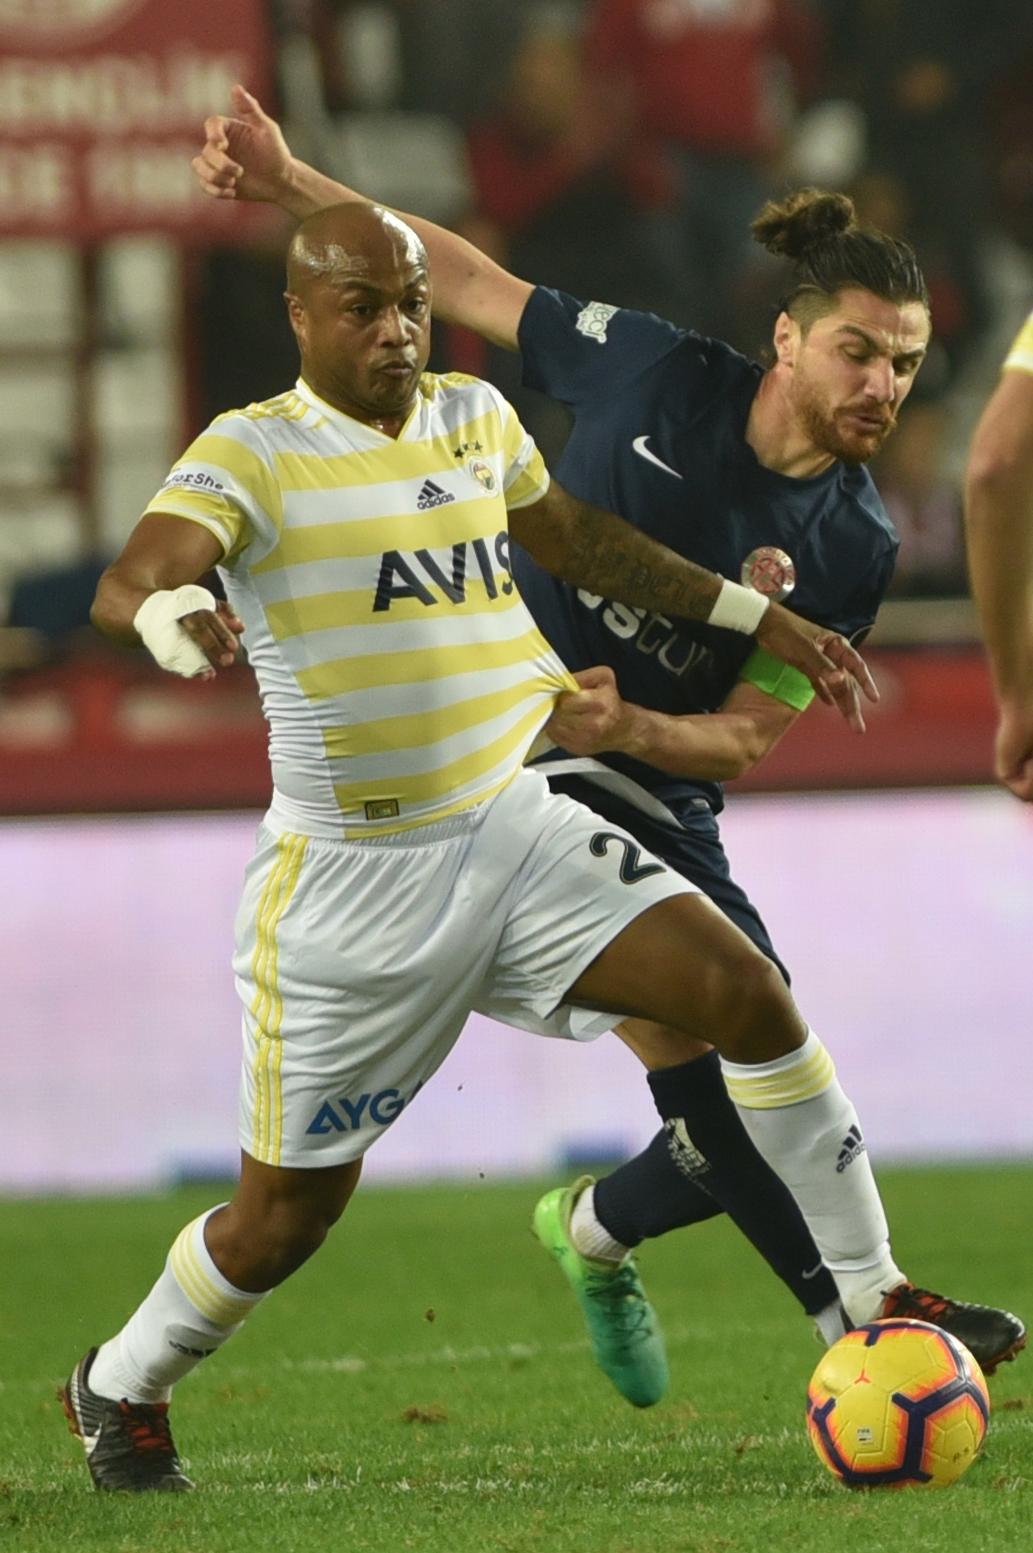 Antalyaspor – Fenerbahçe: 0-0